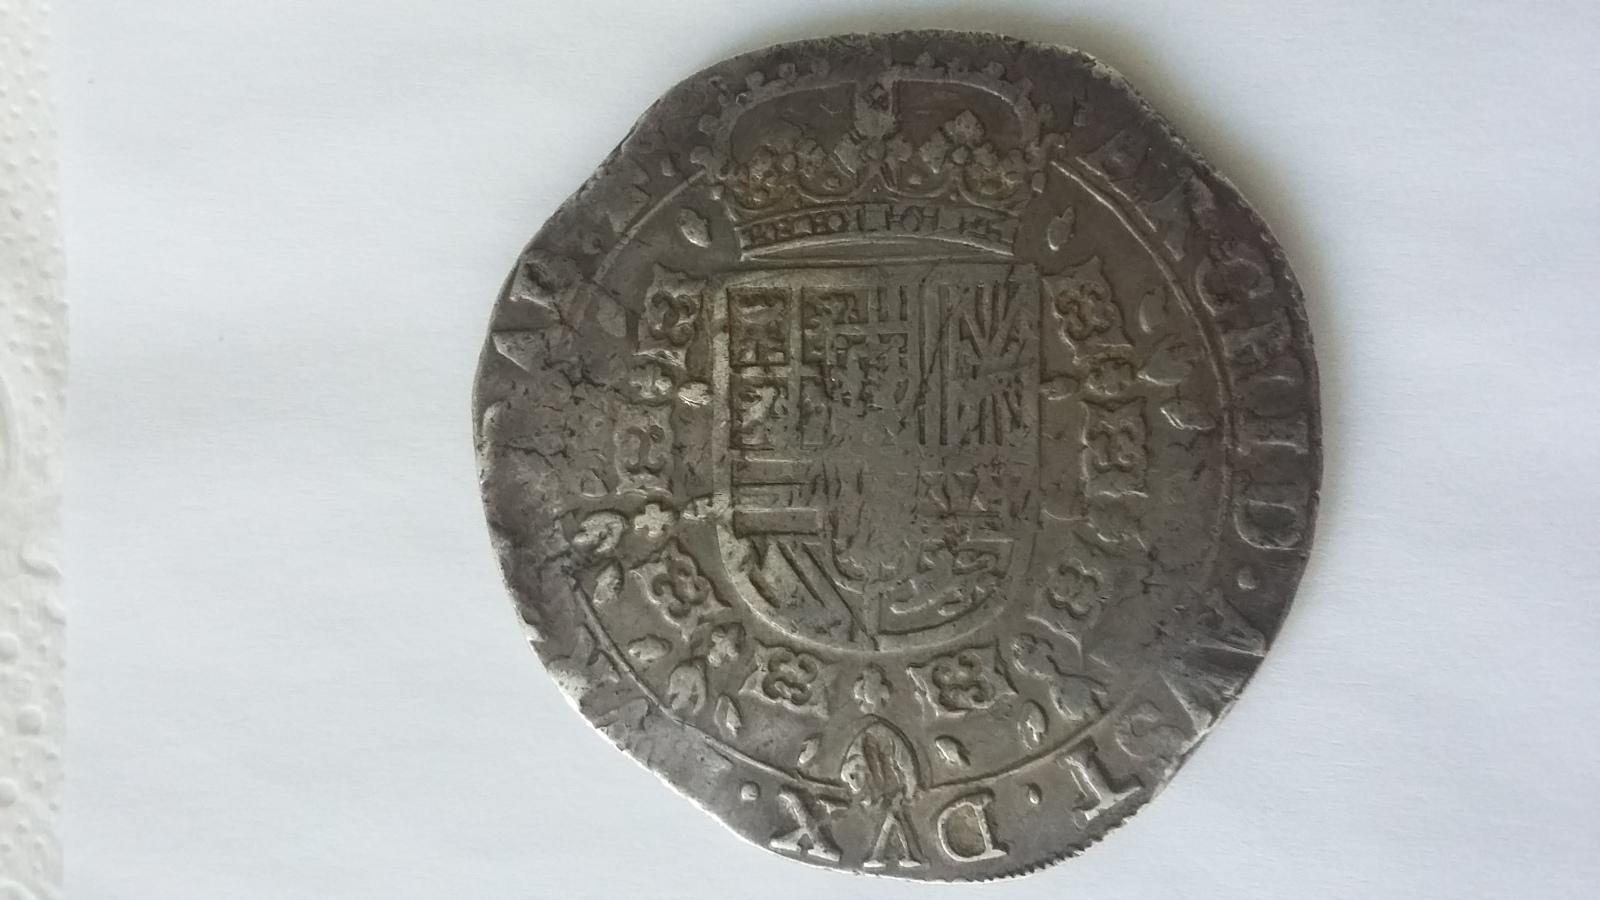 1 patagón 1622. Felipe IV. Amberes 2ql4fid